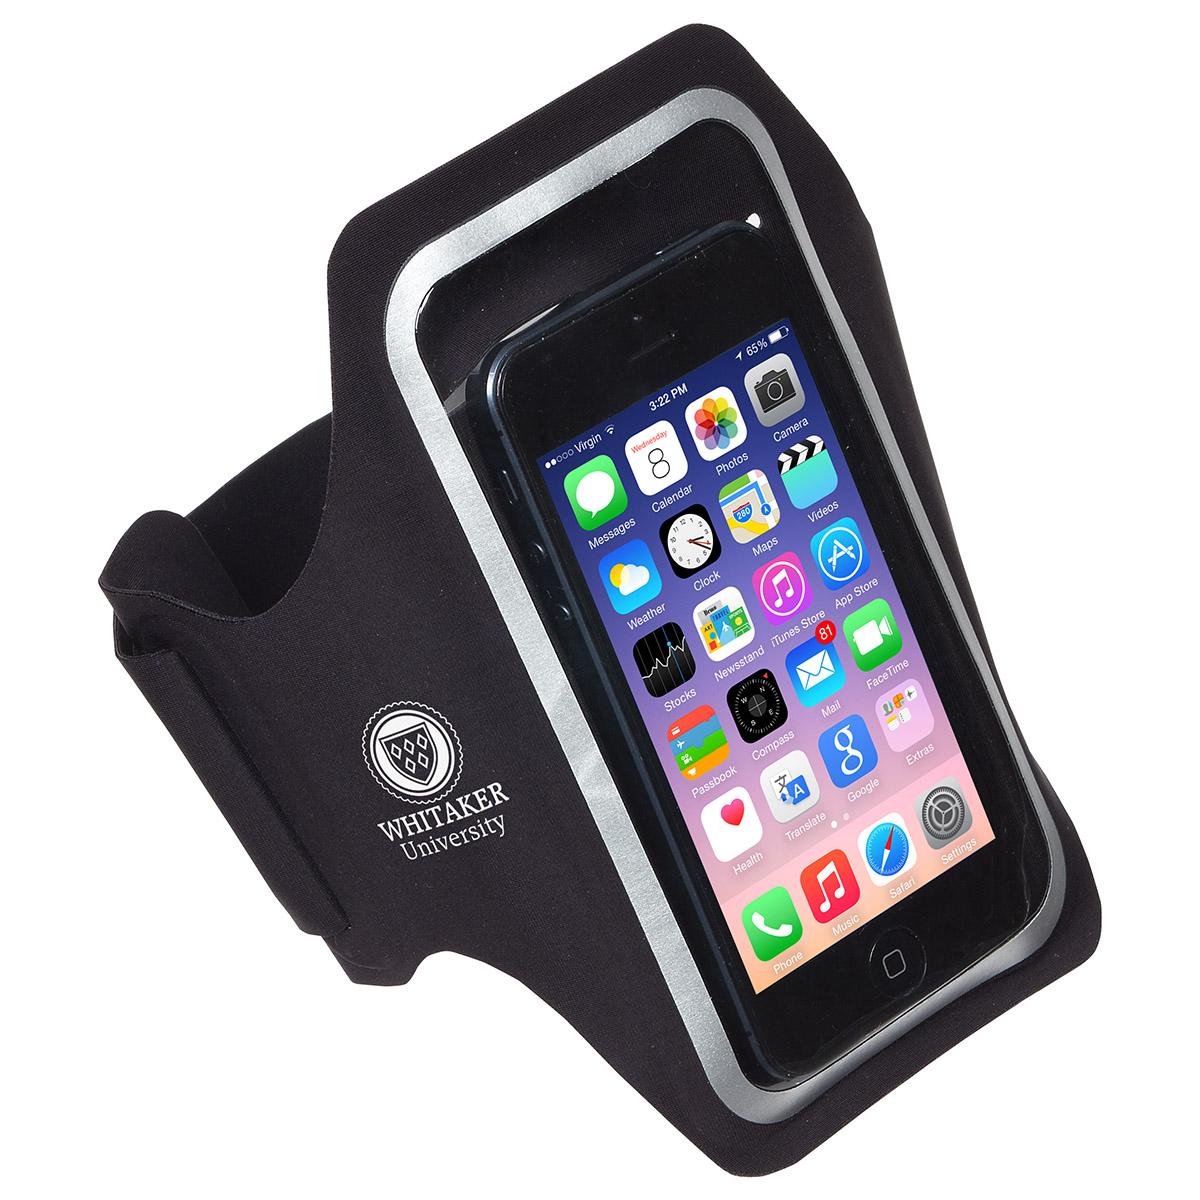 EZ Fitness Phone Armband, WHF-EZ16 - 1 Colour Imprint